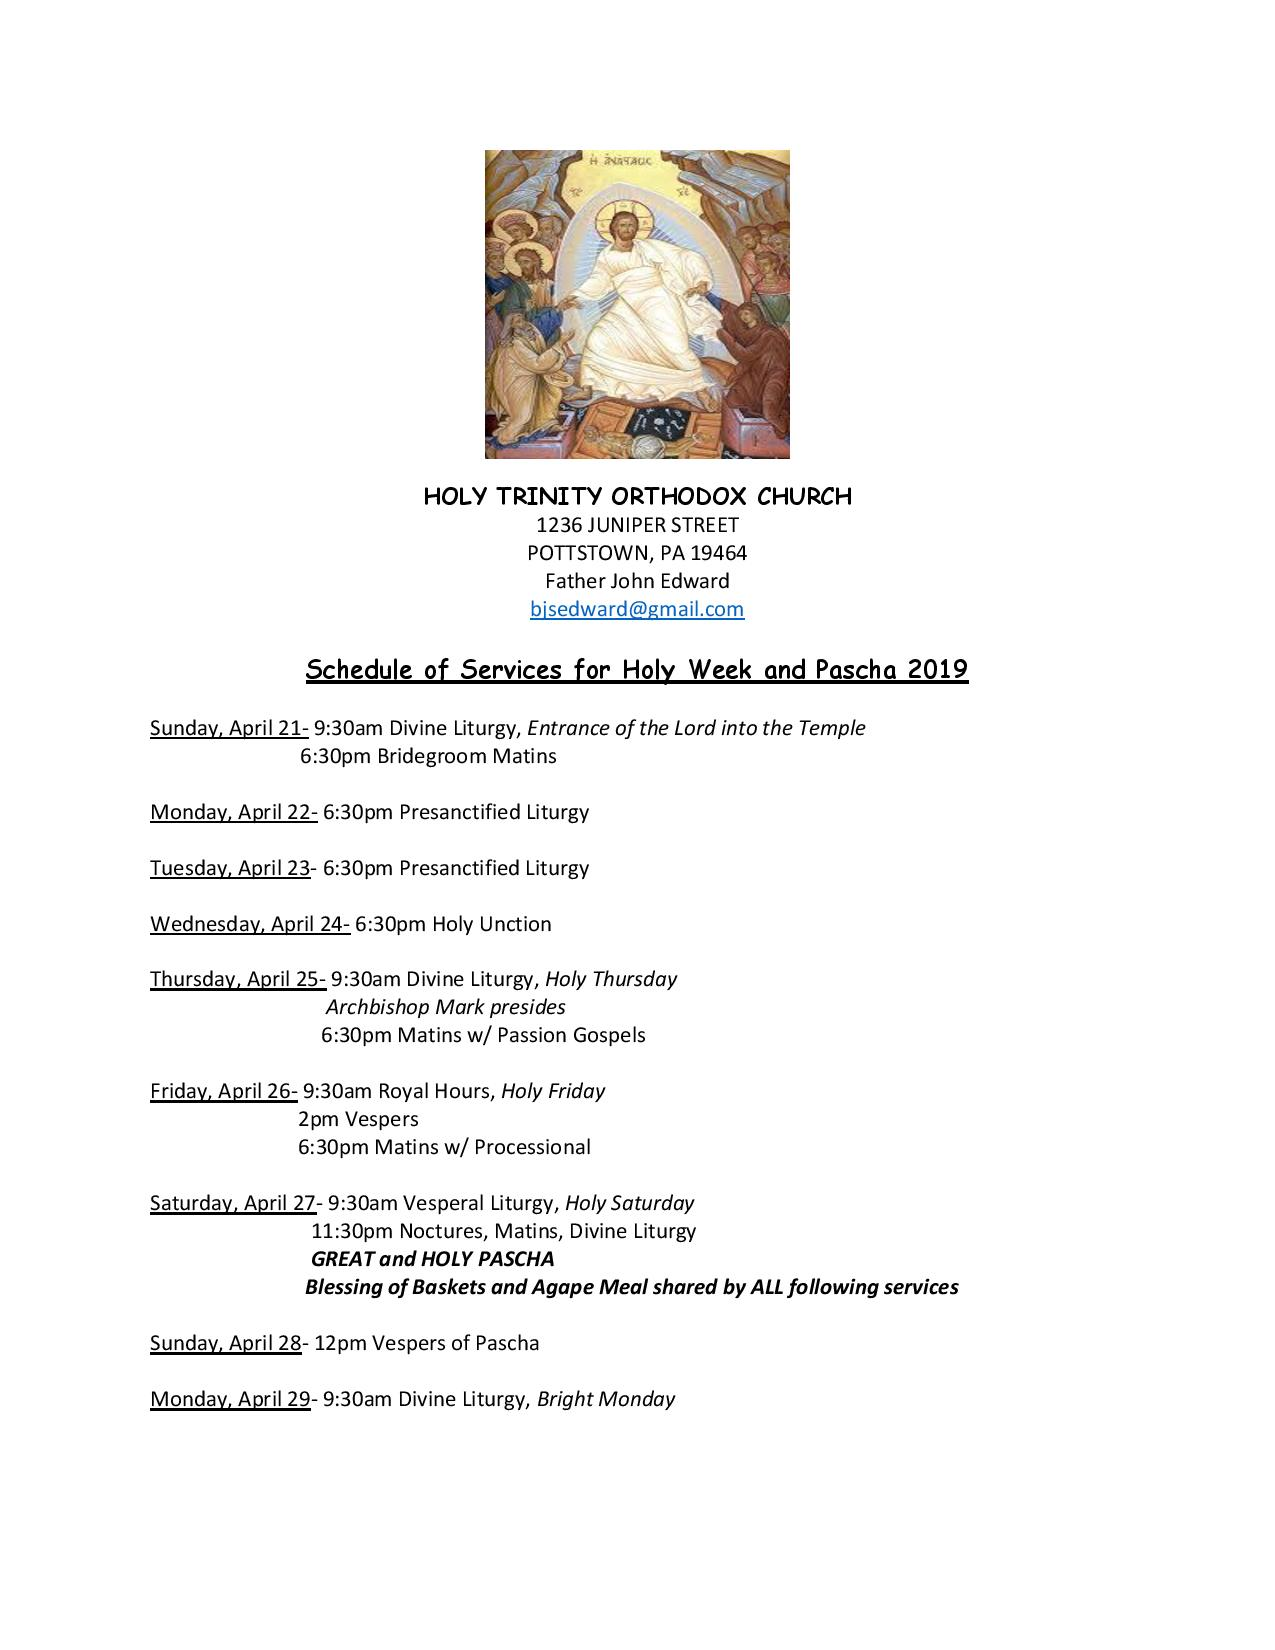 Holy Week 2019 Schedule — Holy Trinity Orthodox Church